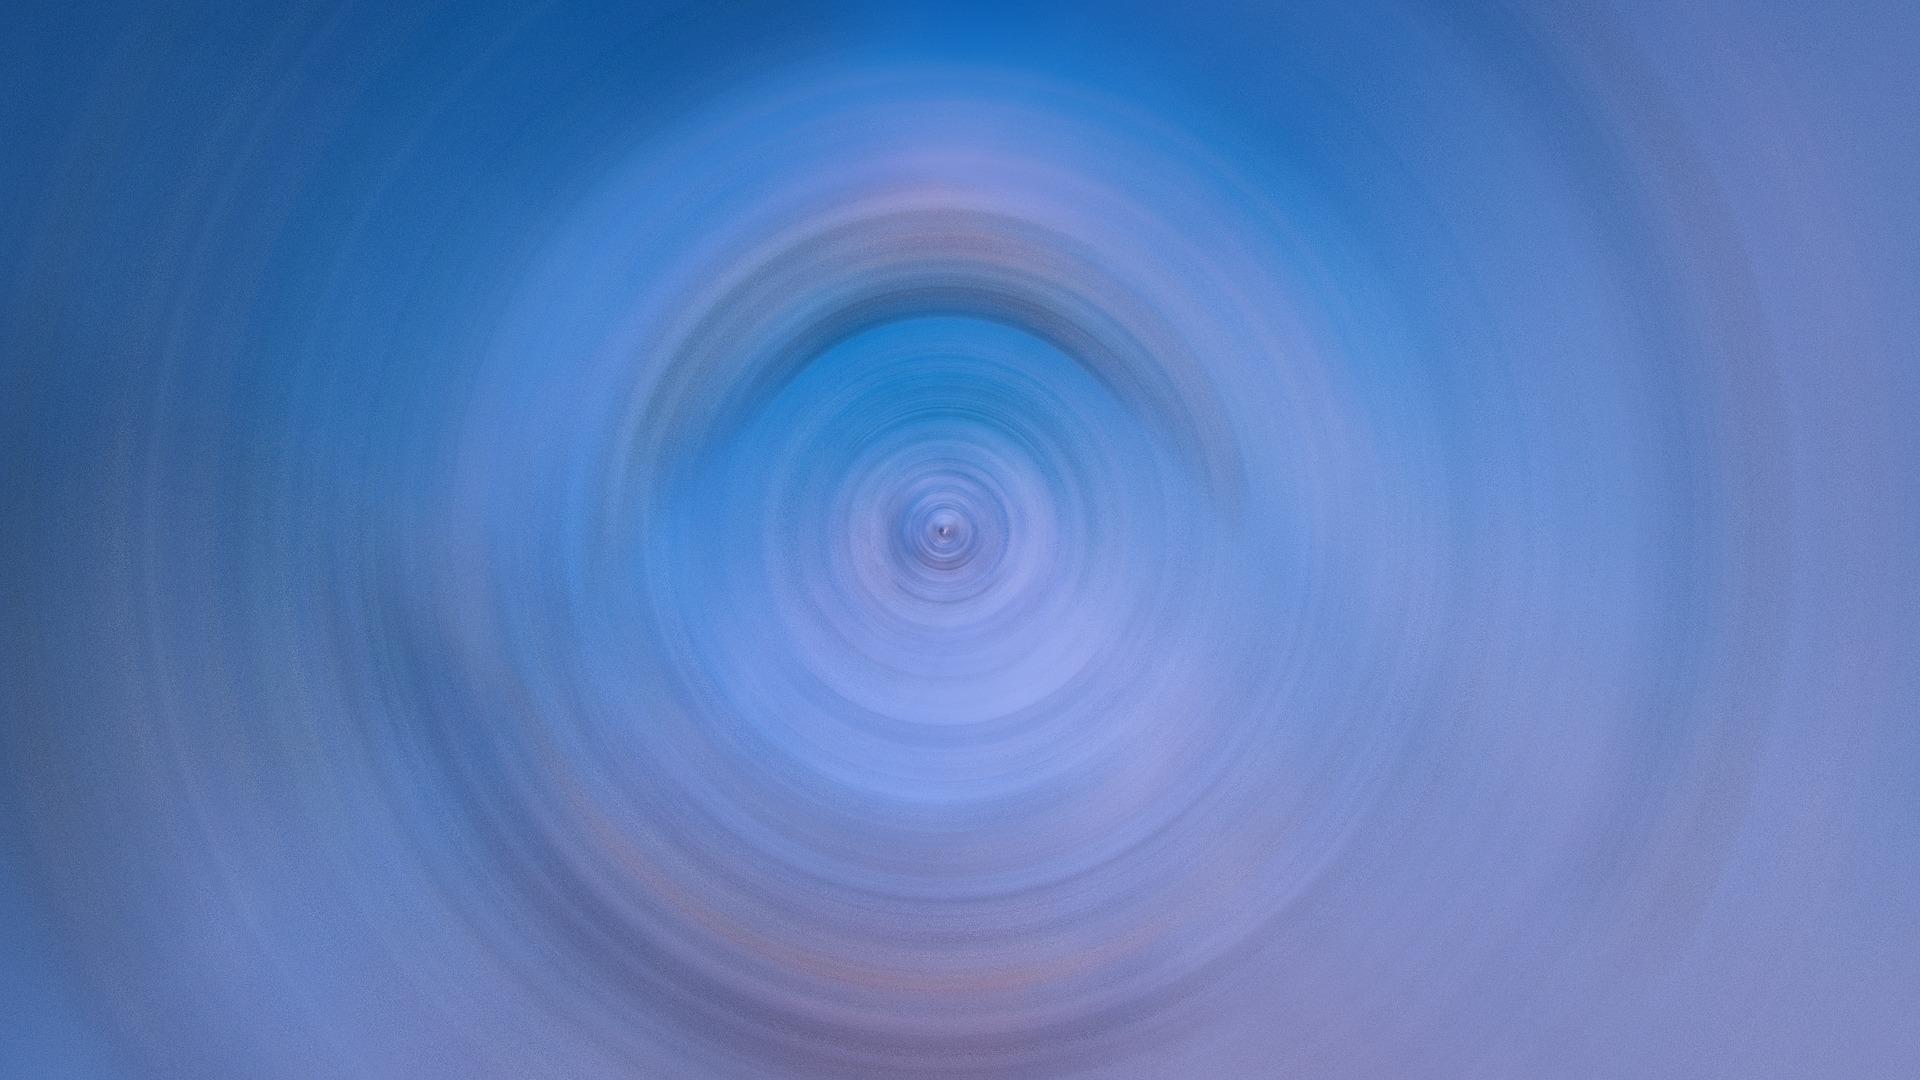 gradient-3385016_1920